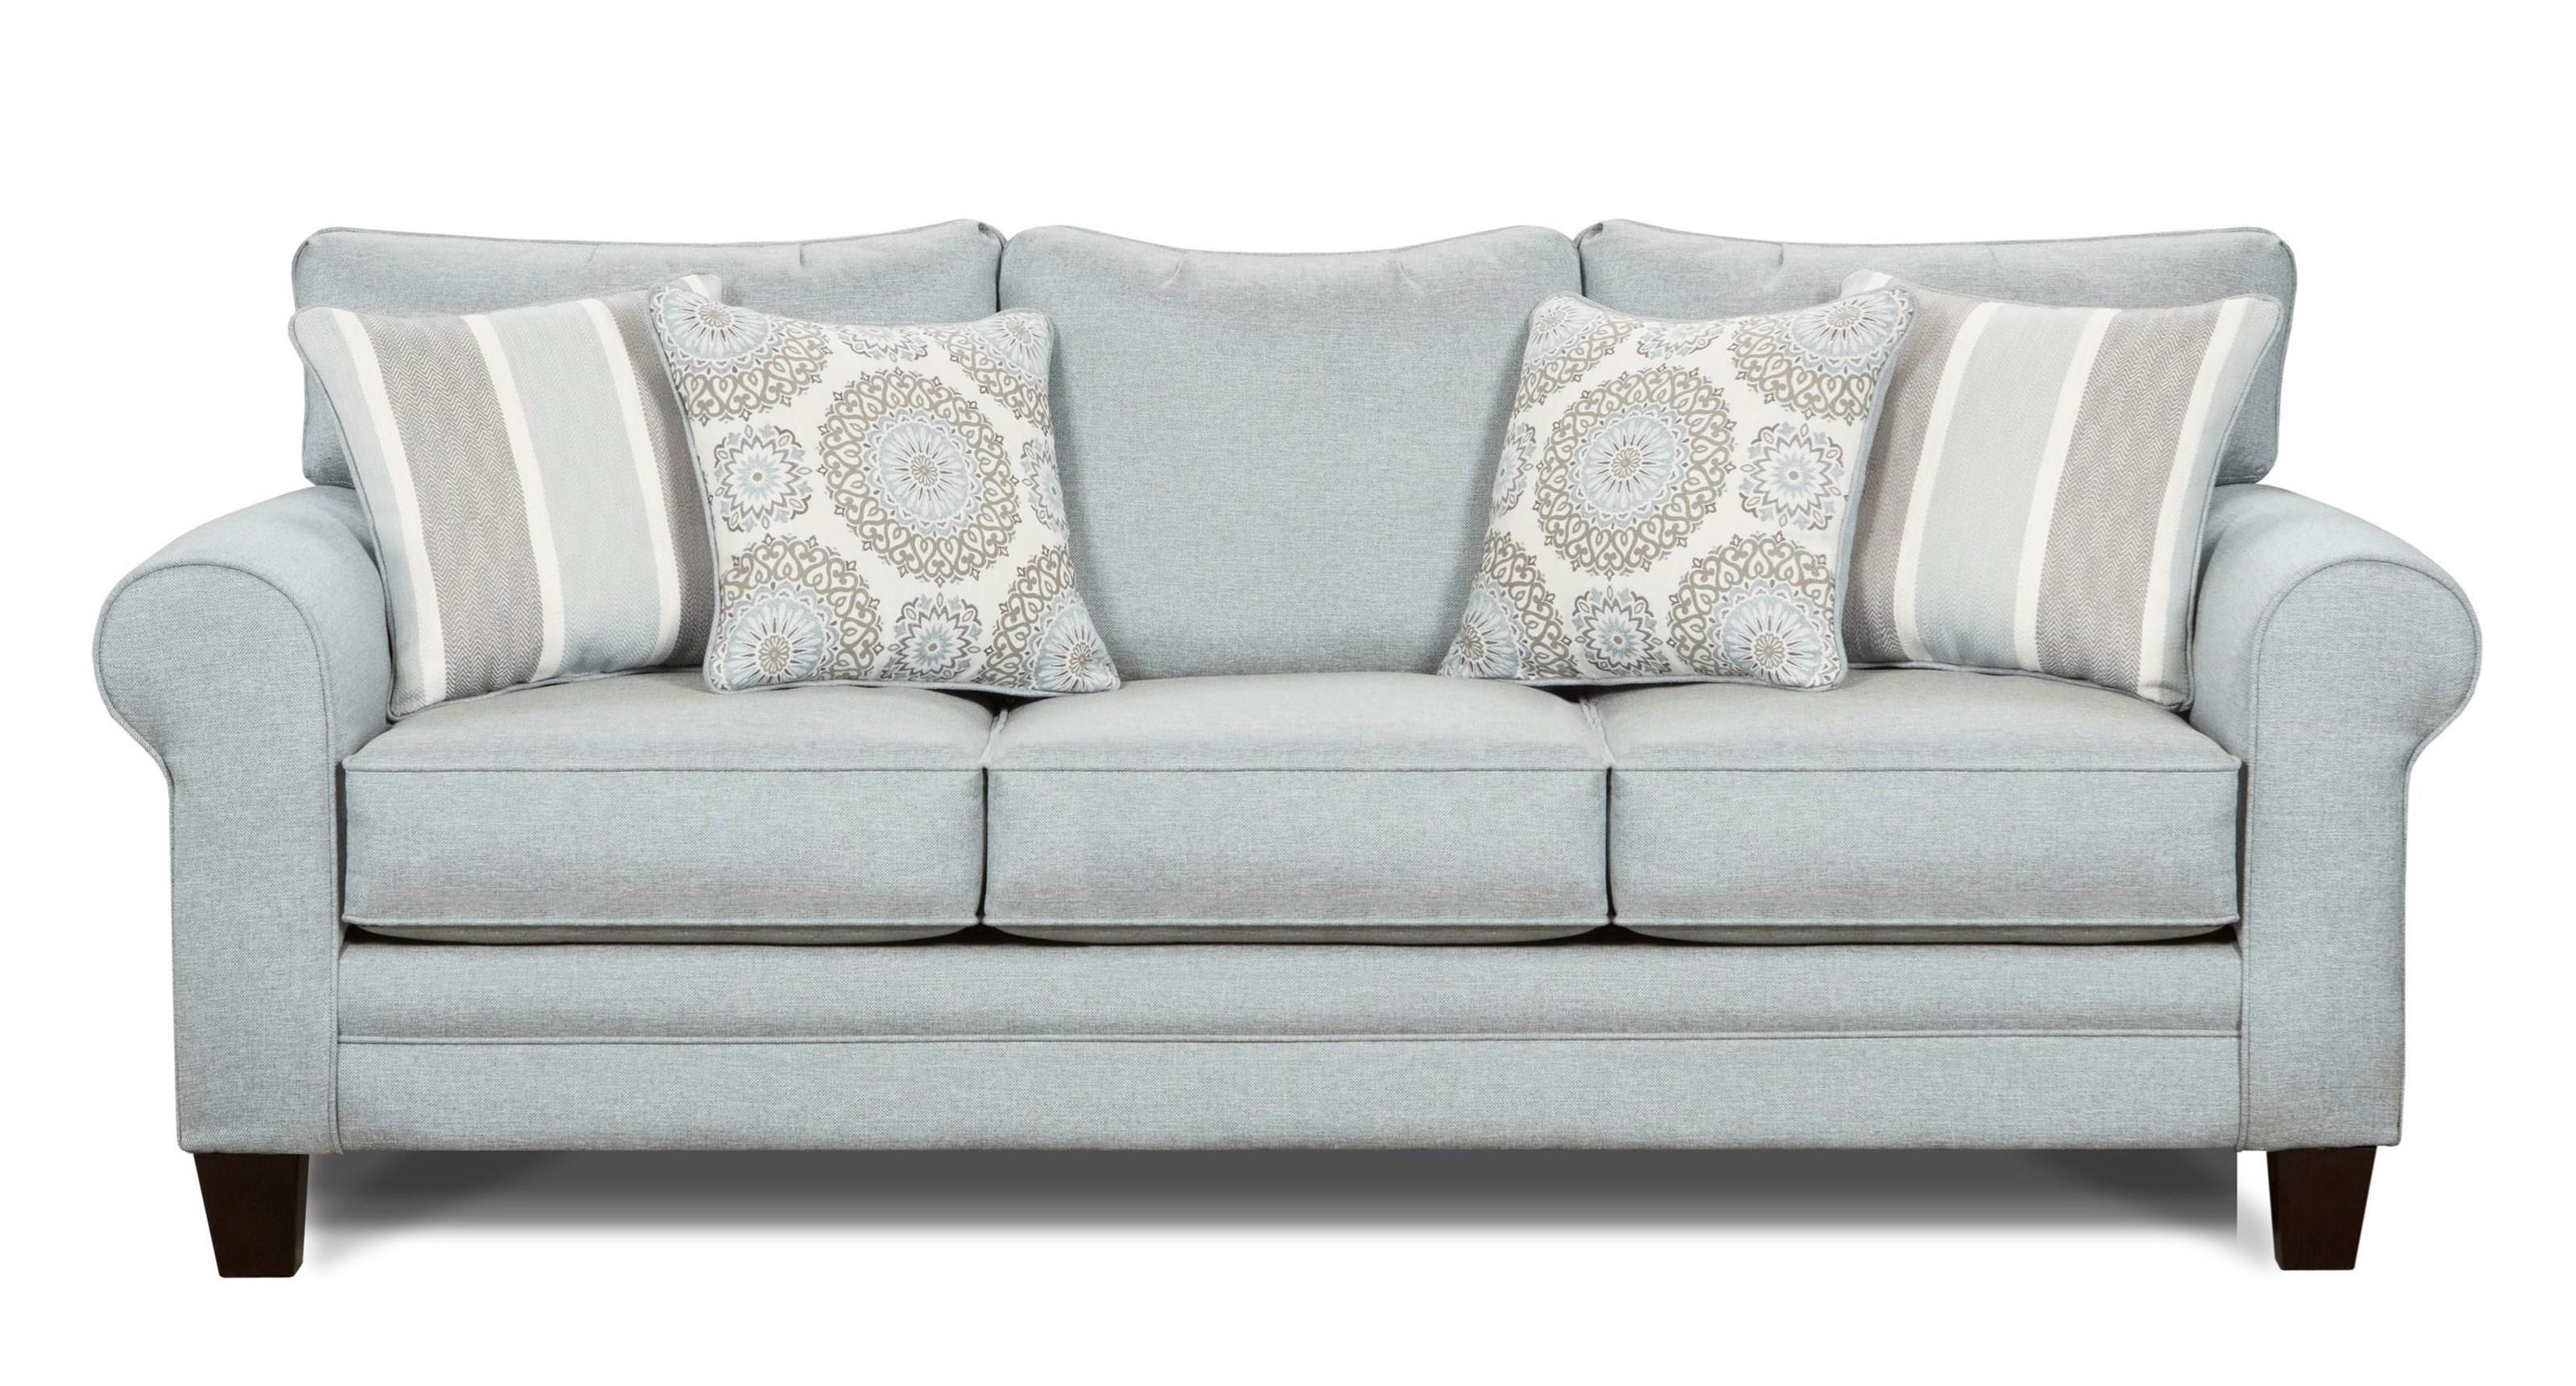 Fusion Furniture Grande MistSleeper Sofa ...